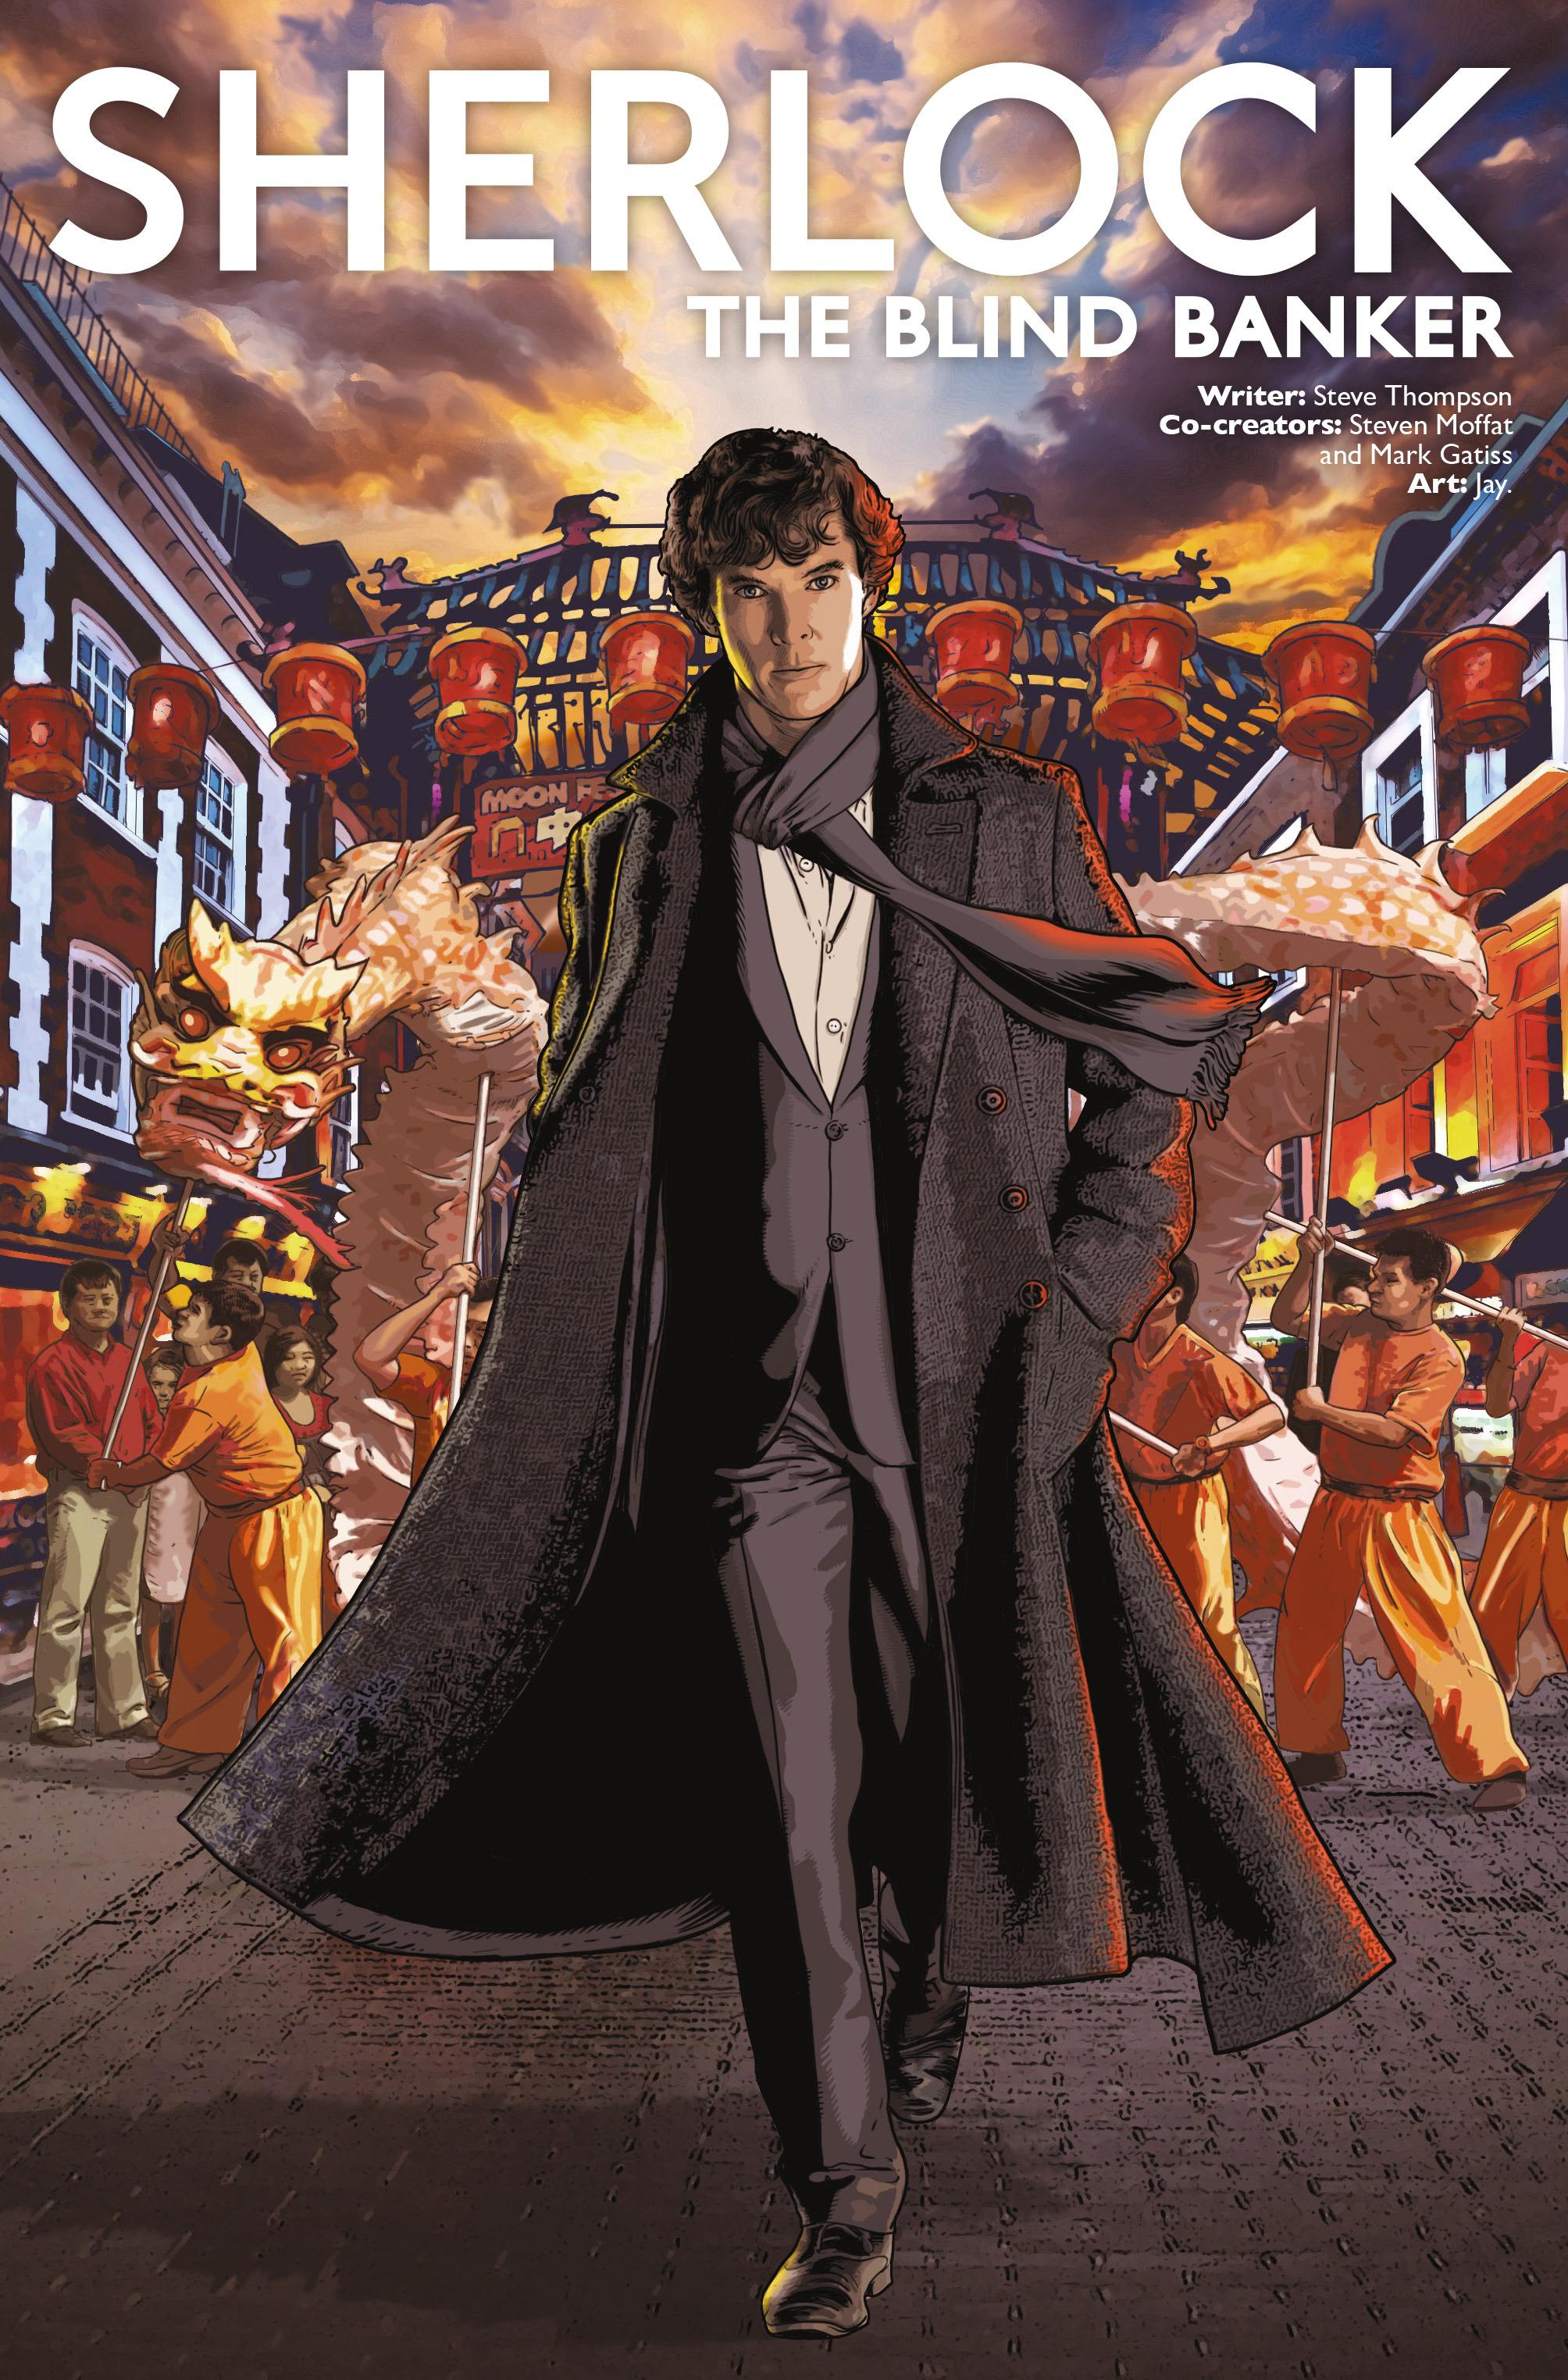 Read online Sherlock: The Blind Banker comic -  Issue #2 - 1